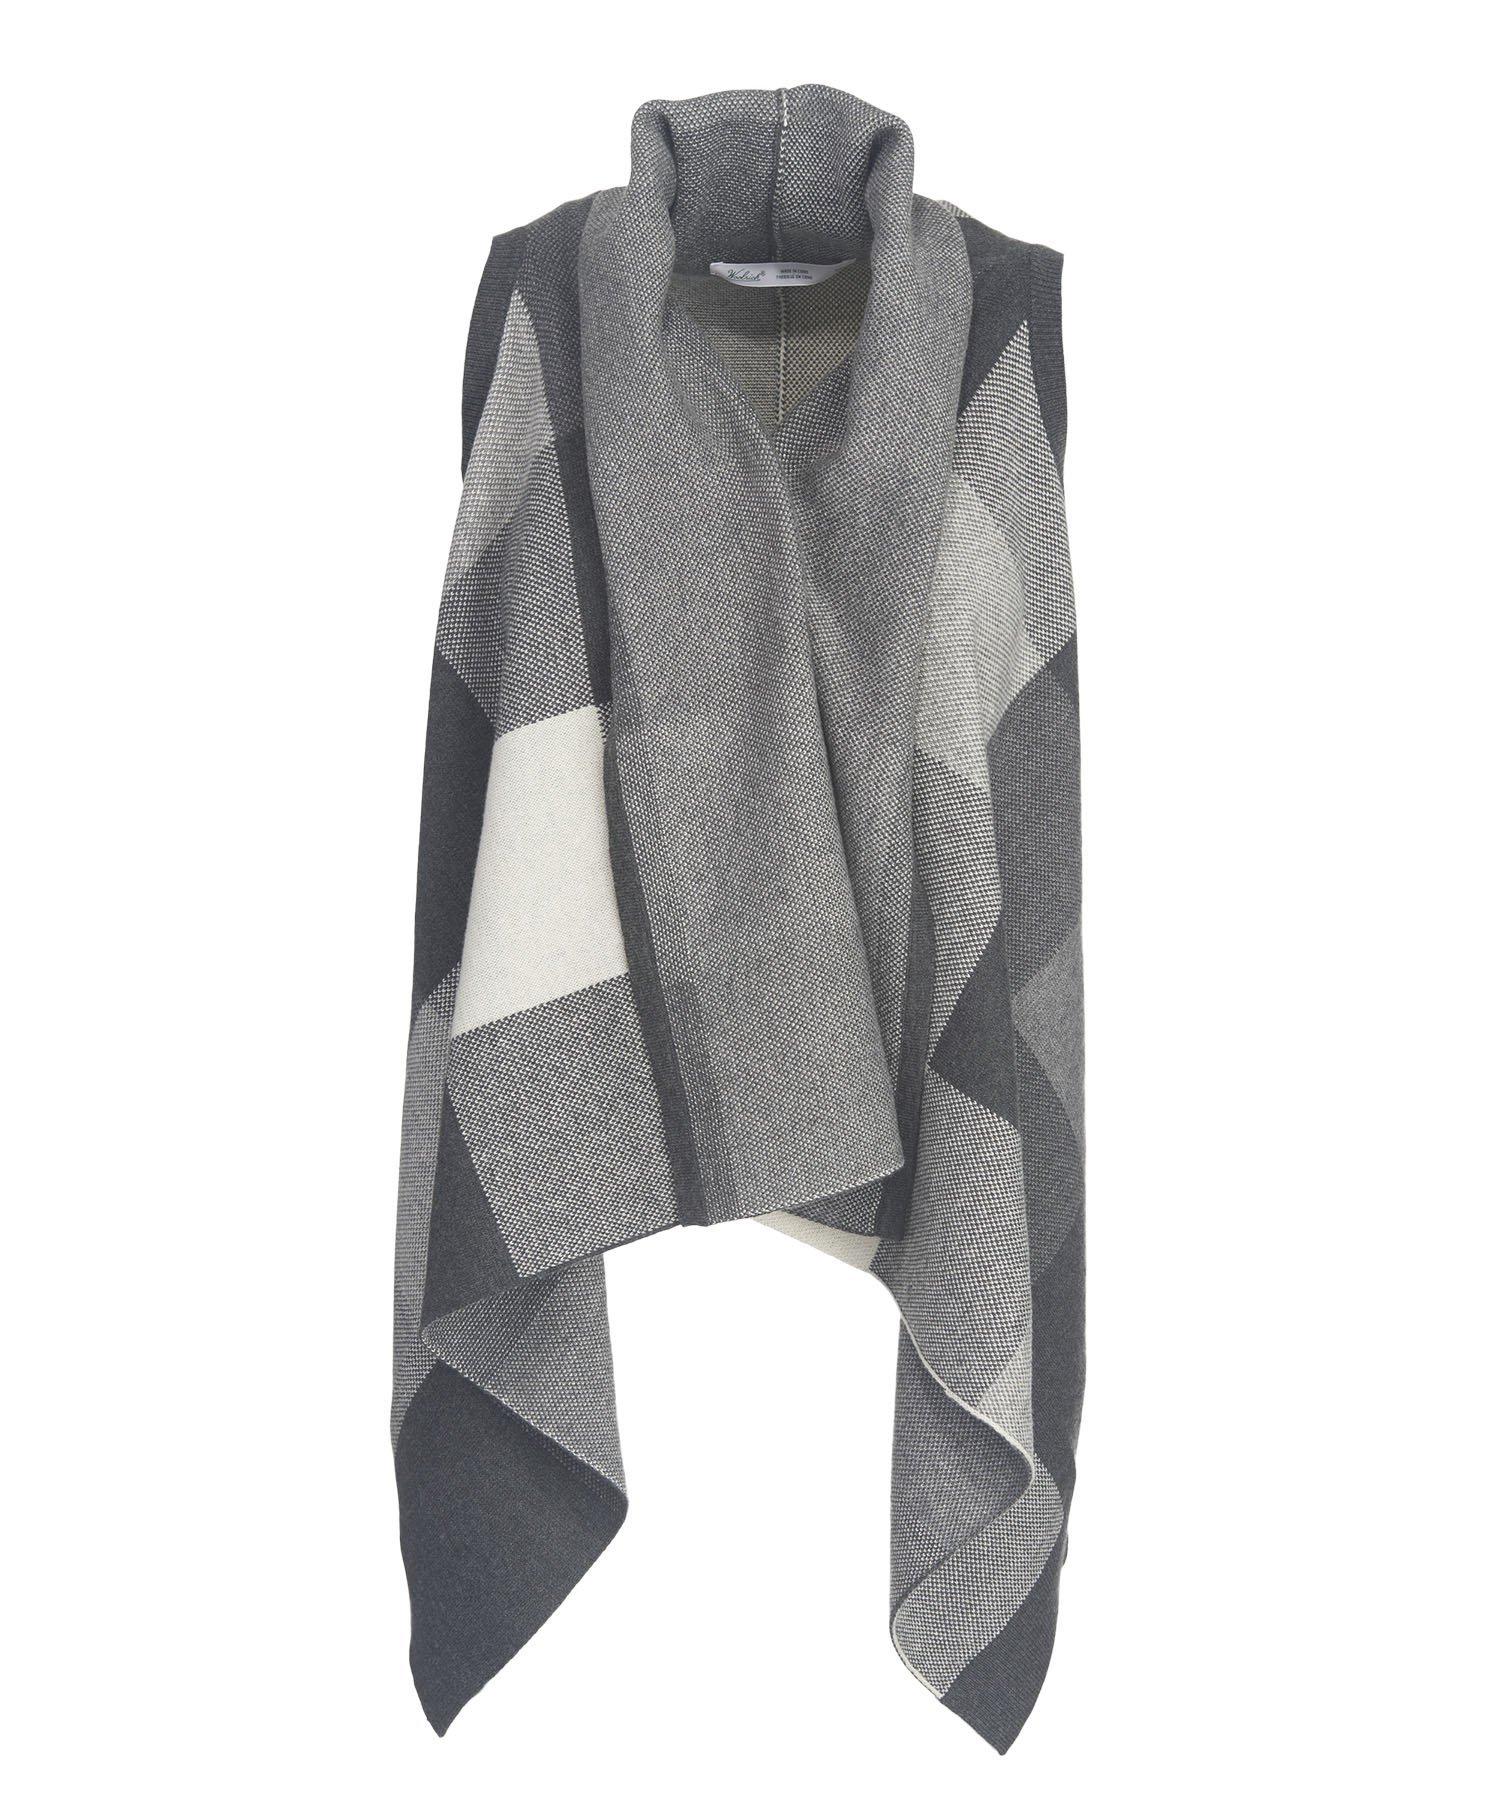 Woolrich Women's Buffalo Check Cardigan Sweater Vest Wrap, COOL GRAY BUFFALO (Gray), Size XL